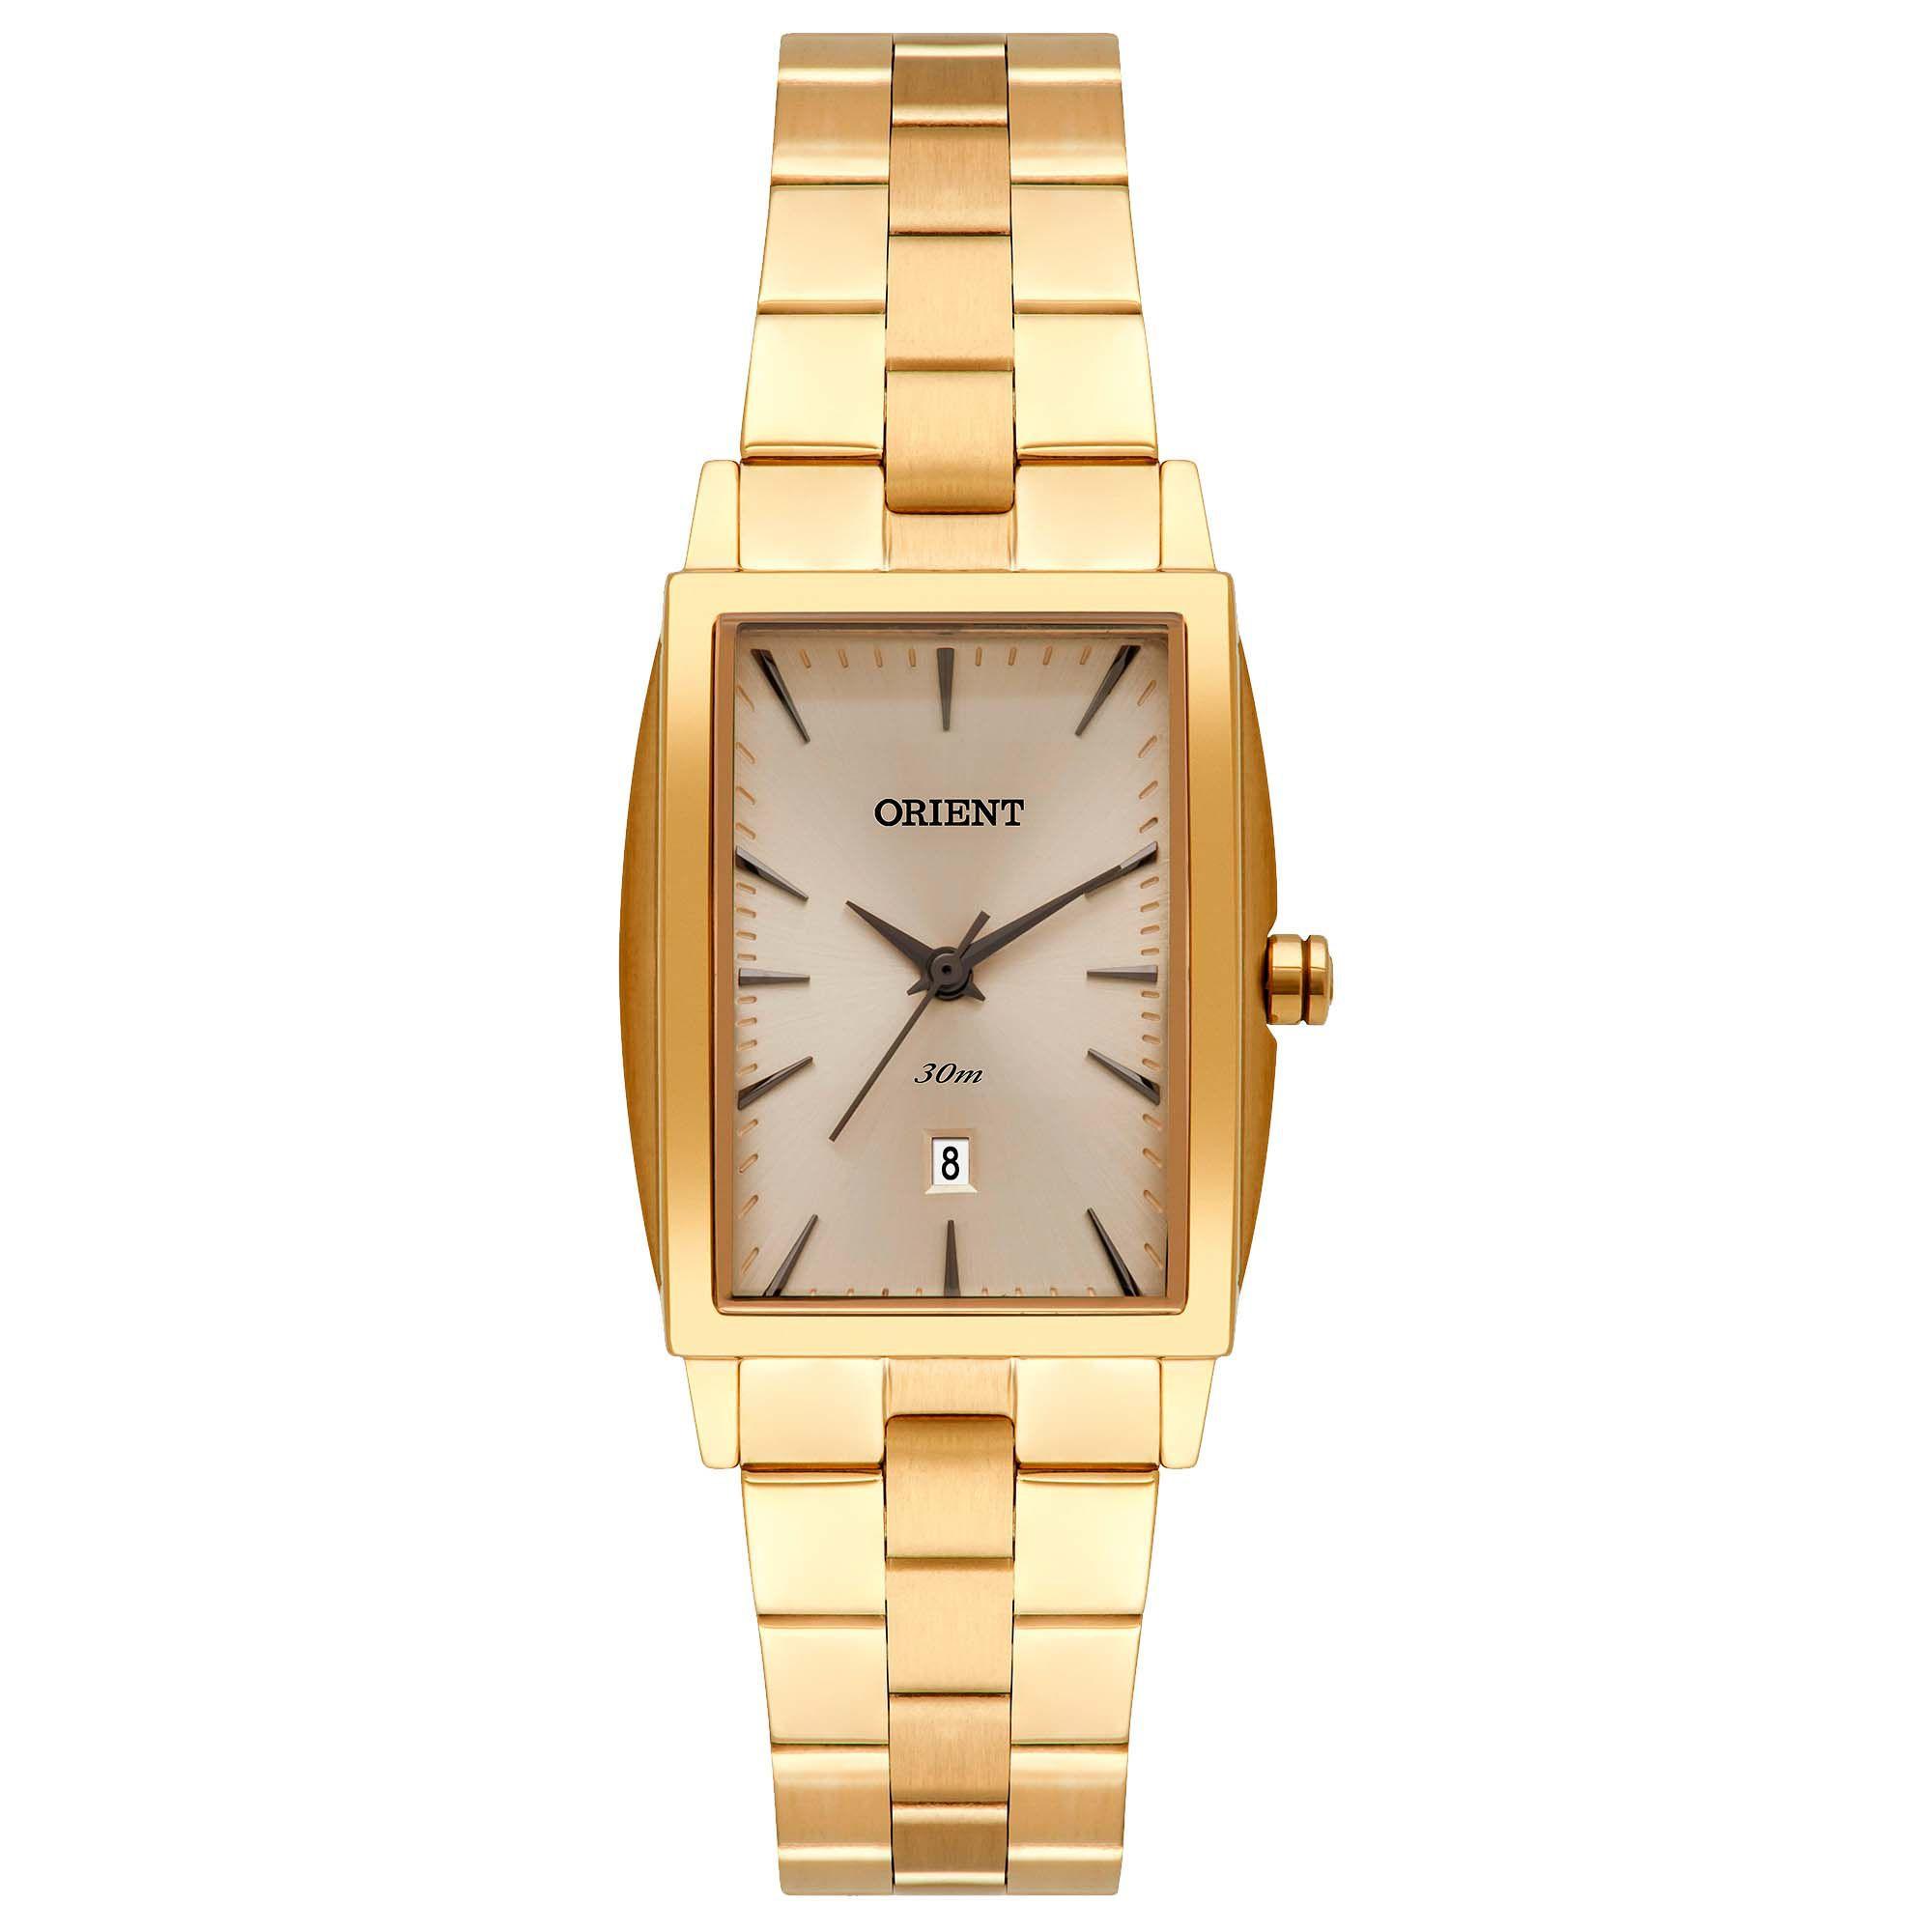 Relógio Feminino Orient LGSS1015 C1KX